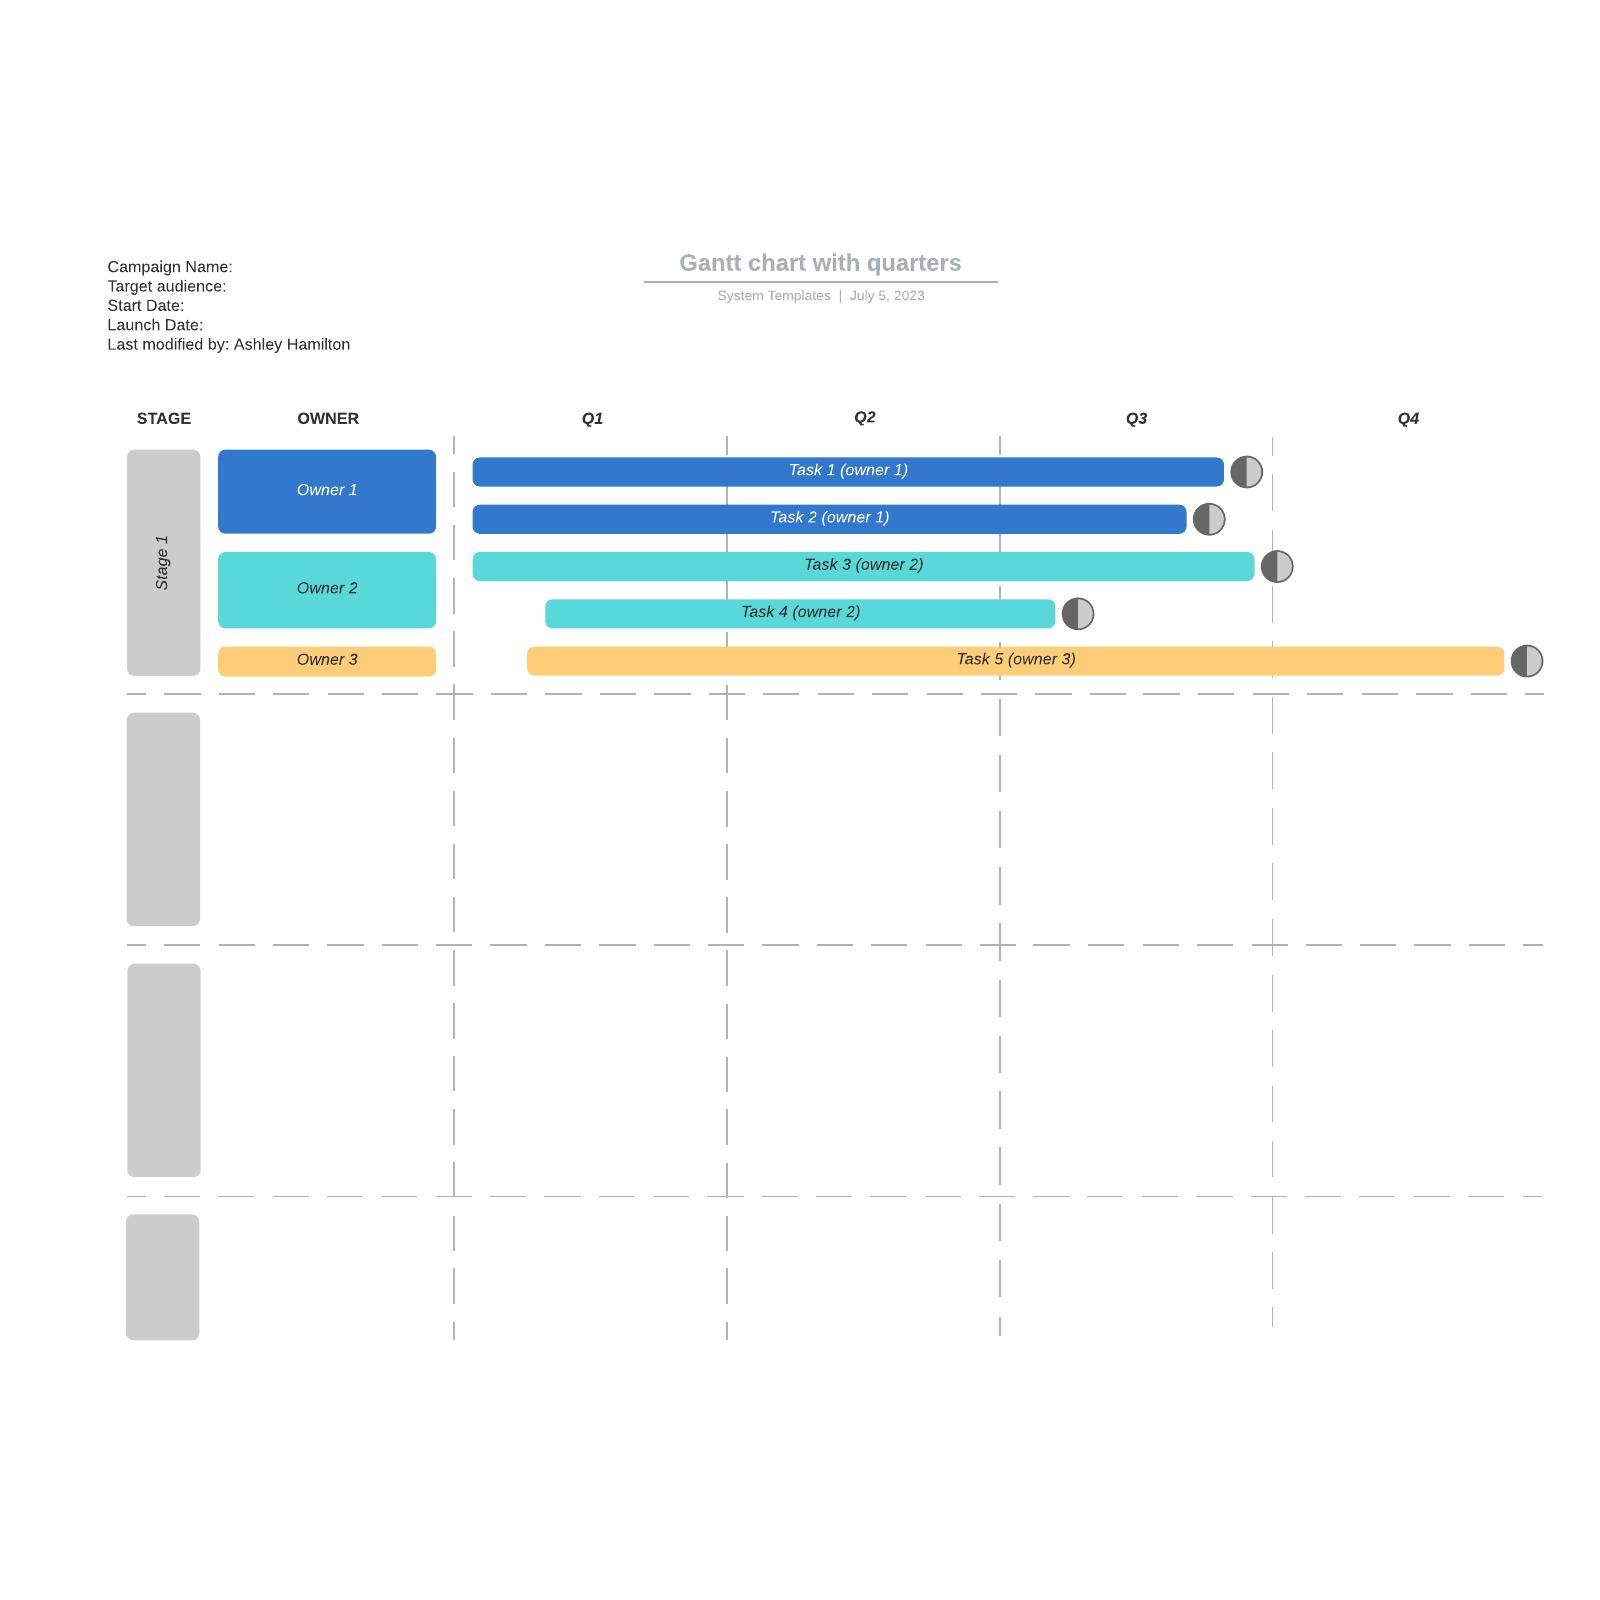 Gantt chart with quarters